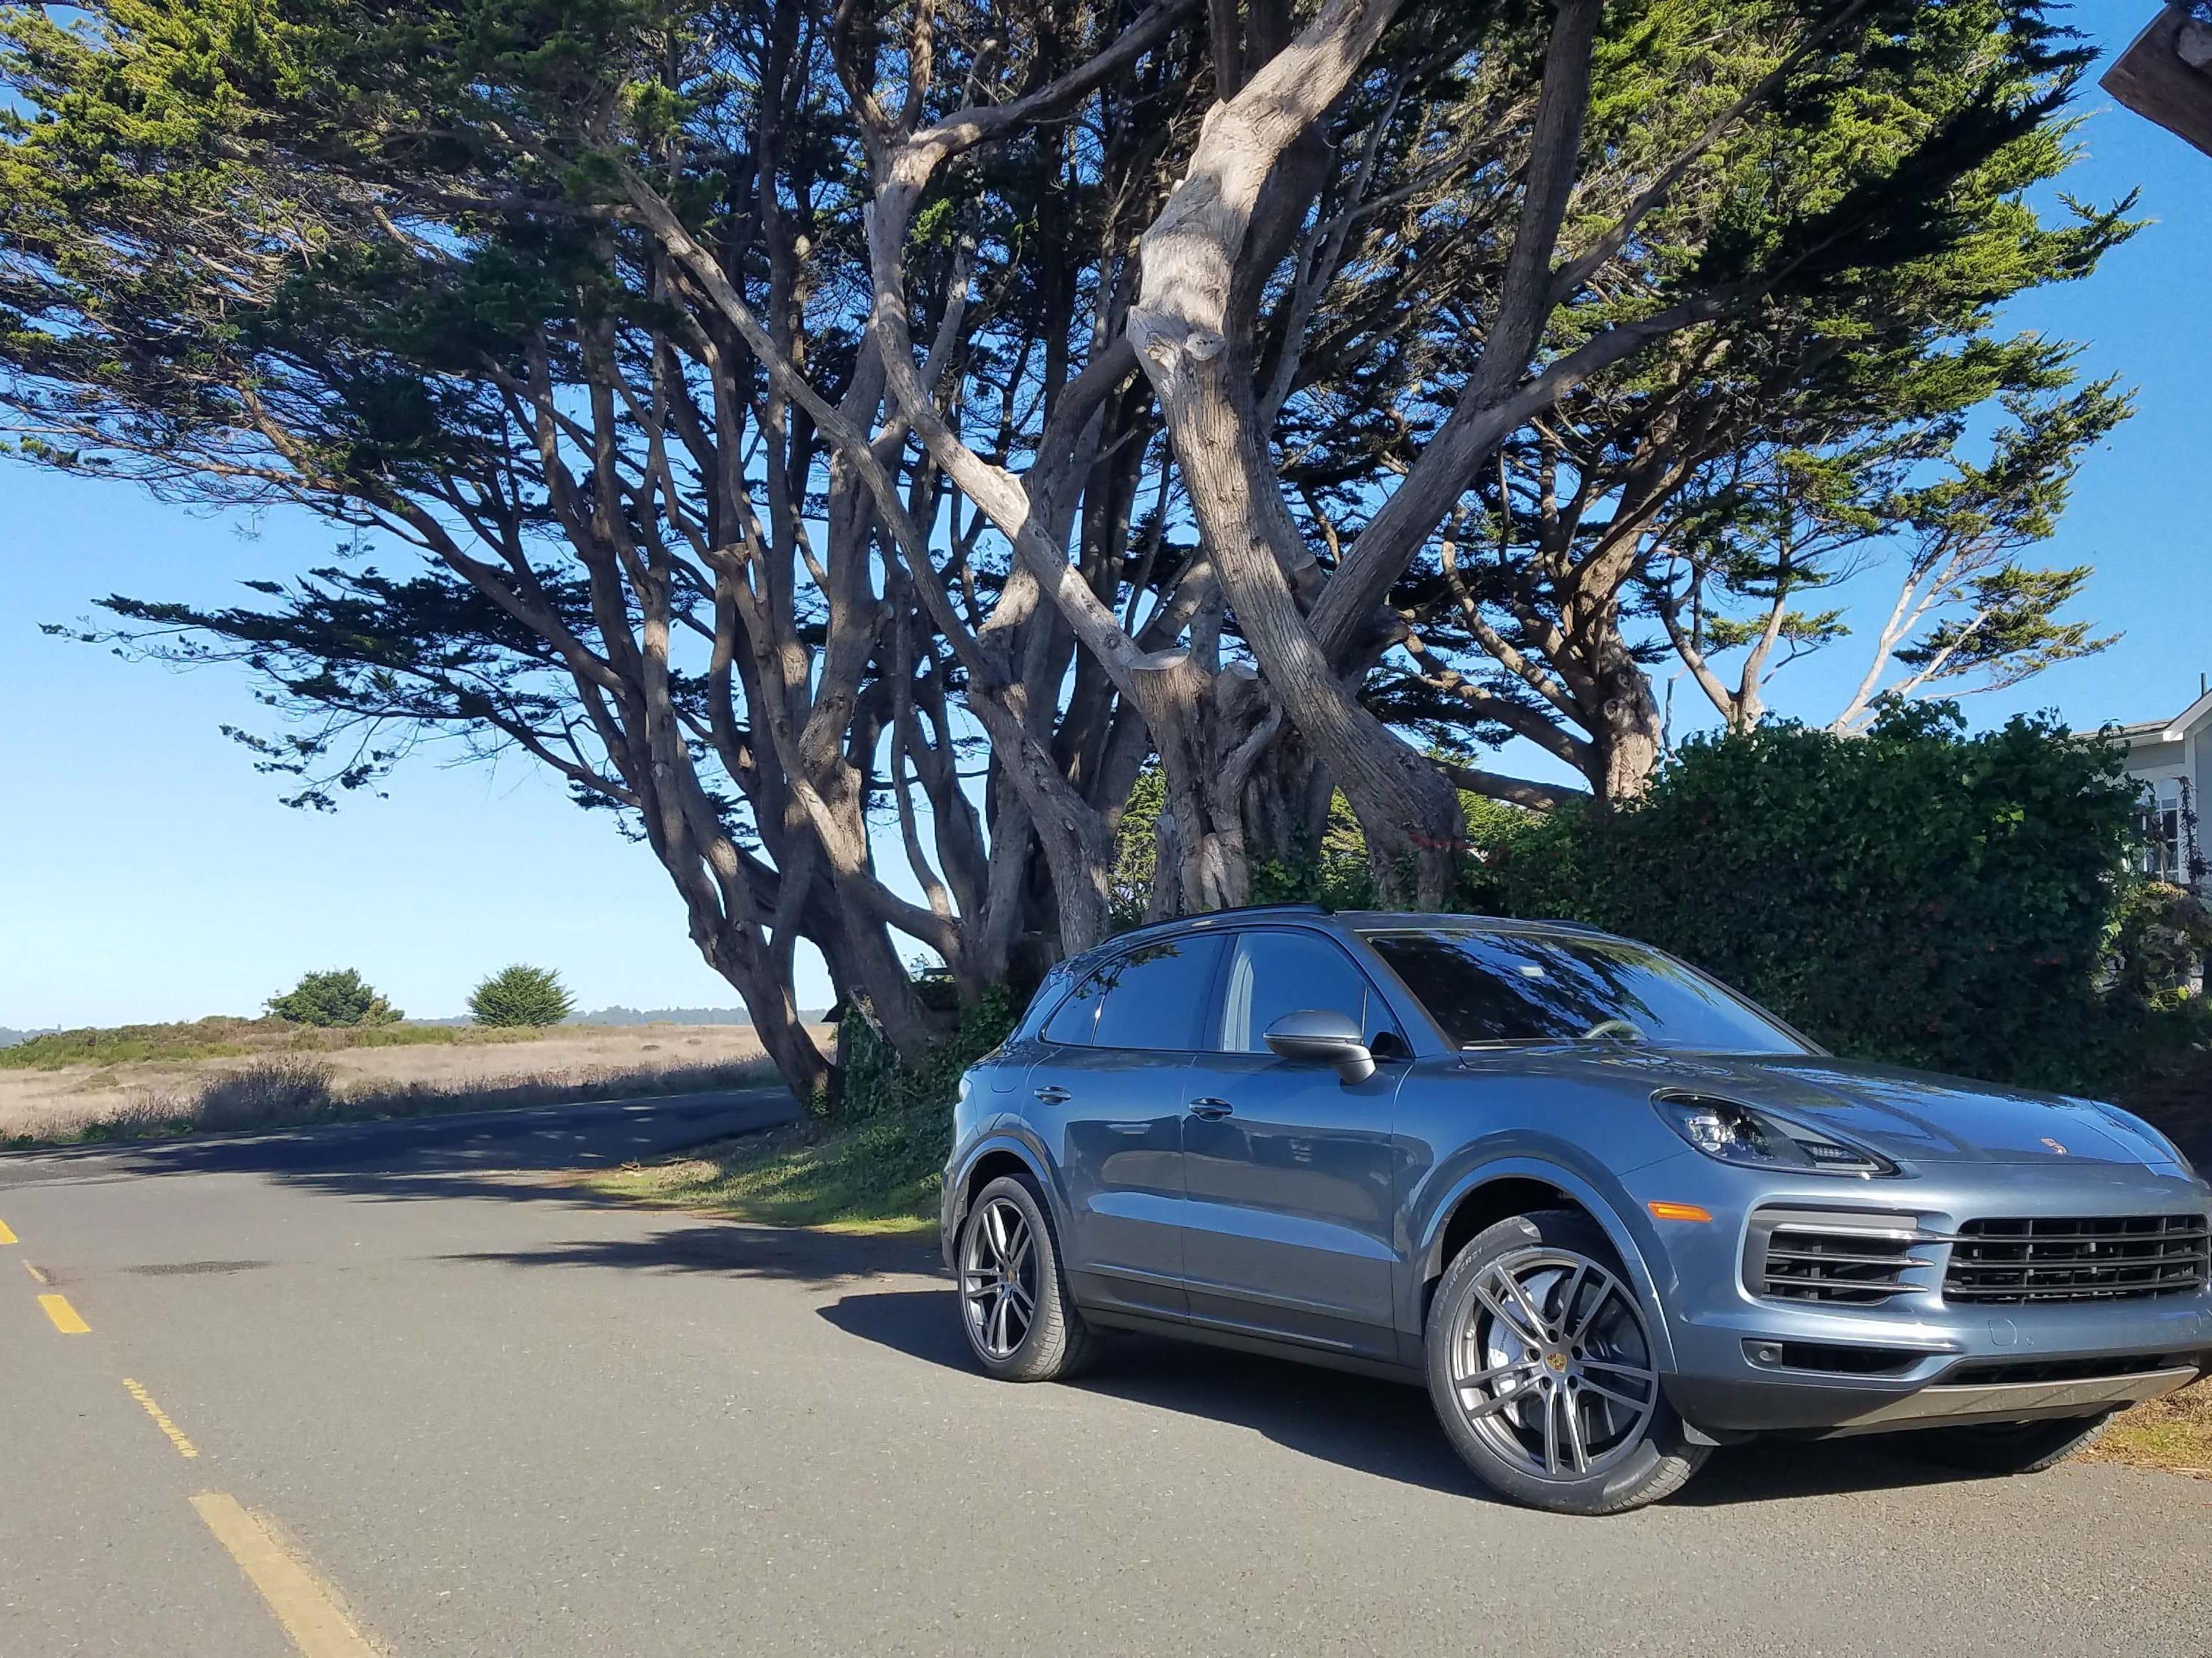 Home sweet home. The 2019, 335-horse, 152-mph, 5.6-sec-zero-60 Porsche Cayenne family ute.